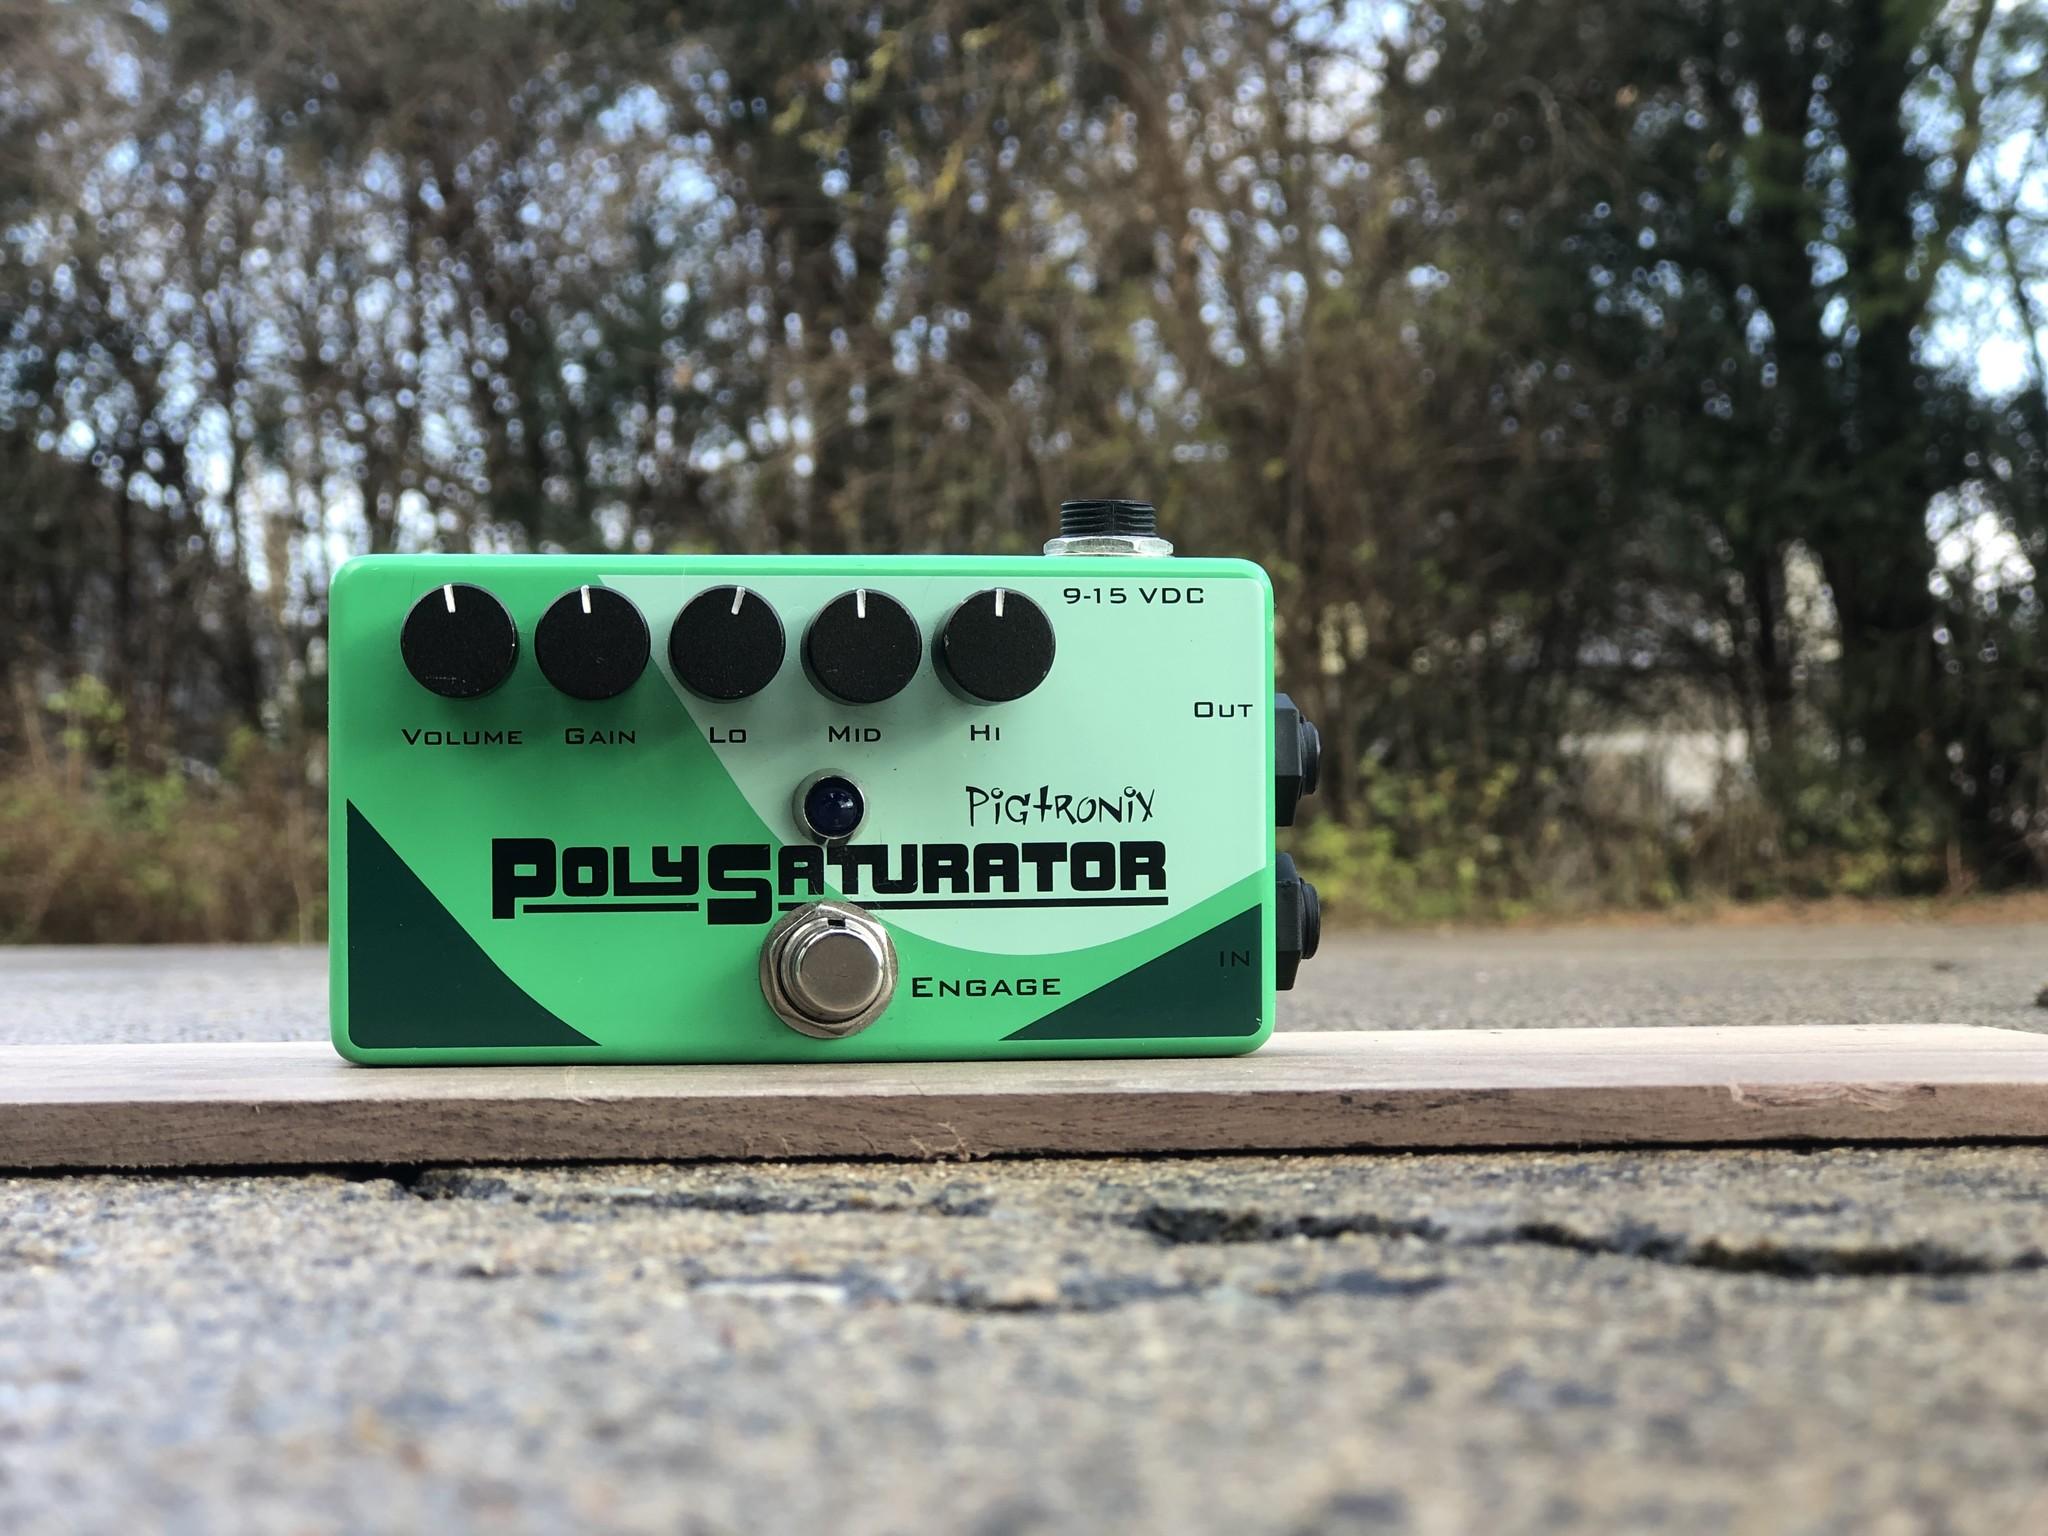 Pigtronix PolySaturator Distortion Pedal-1